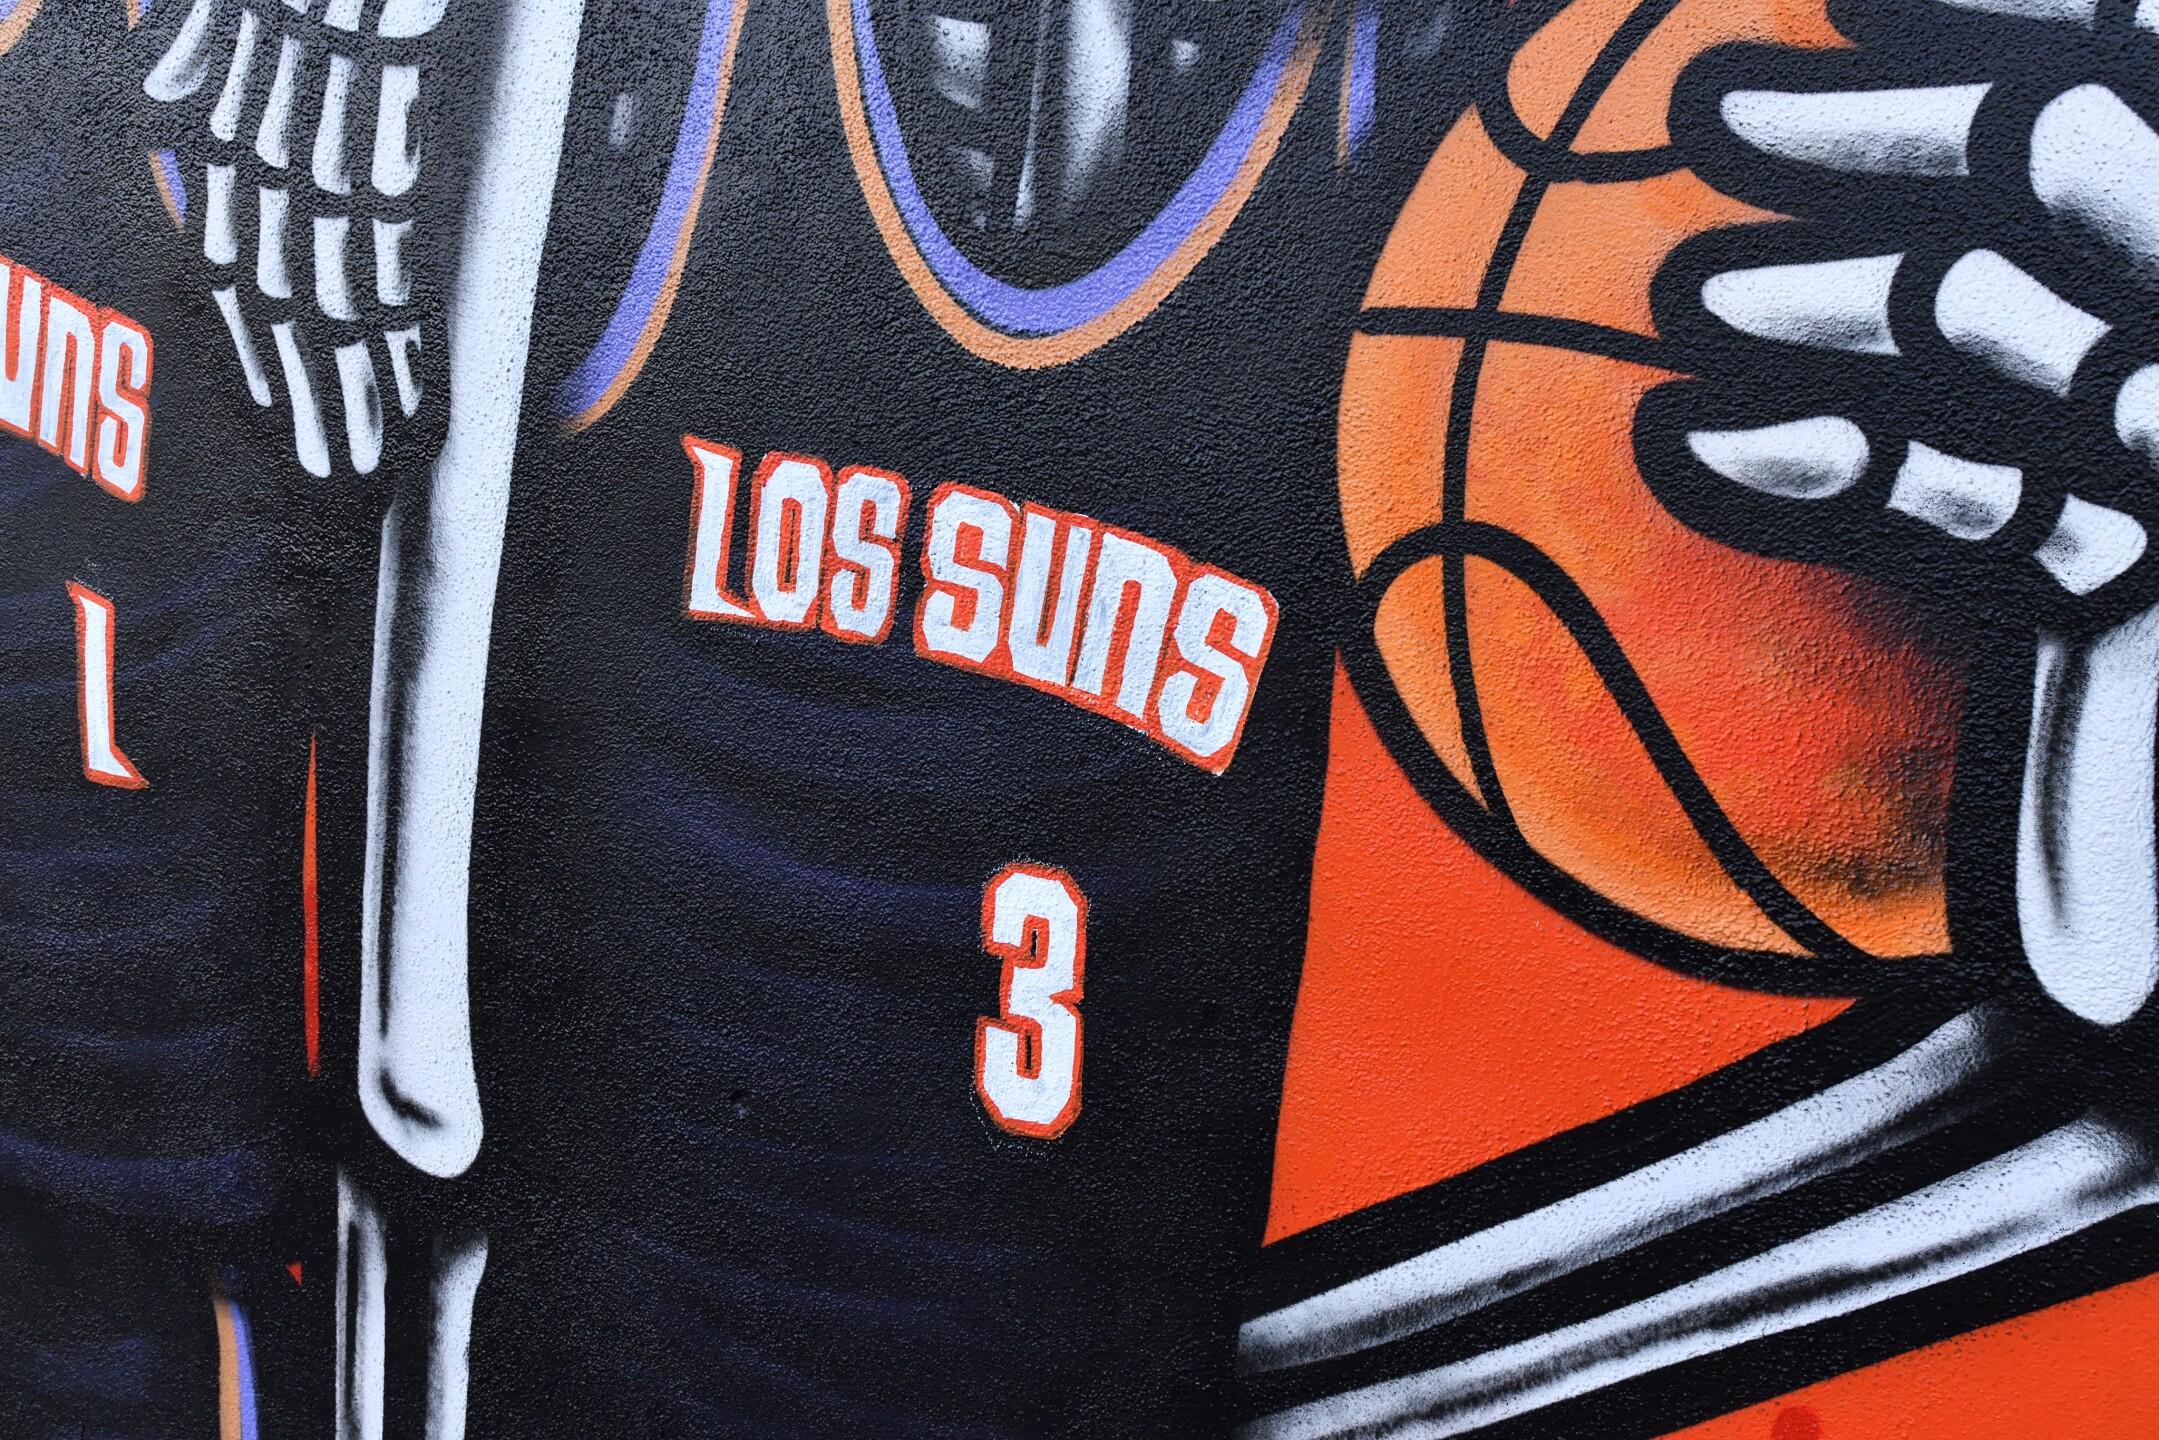 Los Suns Mural 7.jpeg